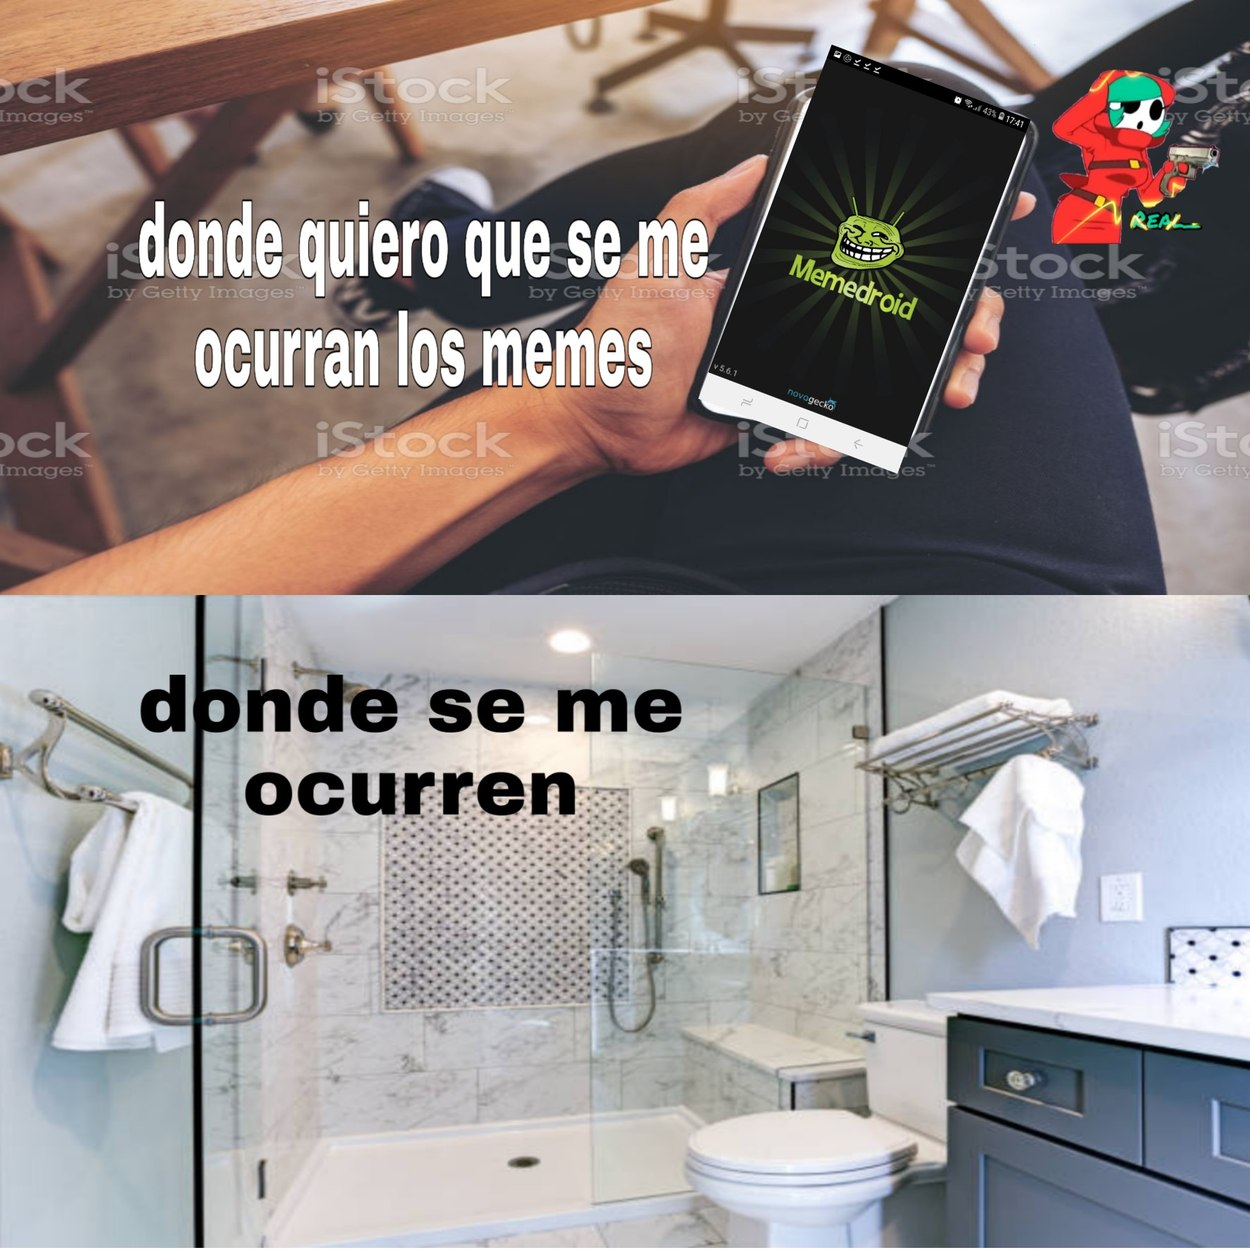 Uff qué buena ducha se me ocurrio al tiro un meme